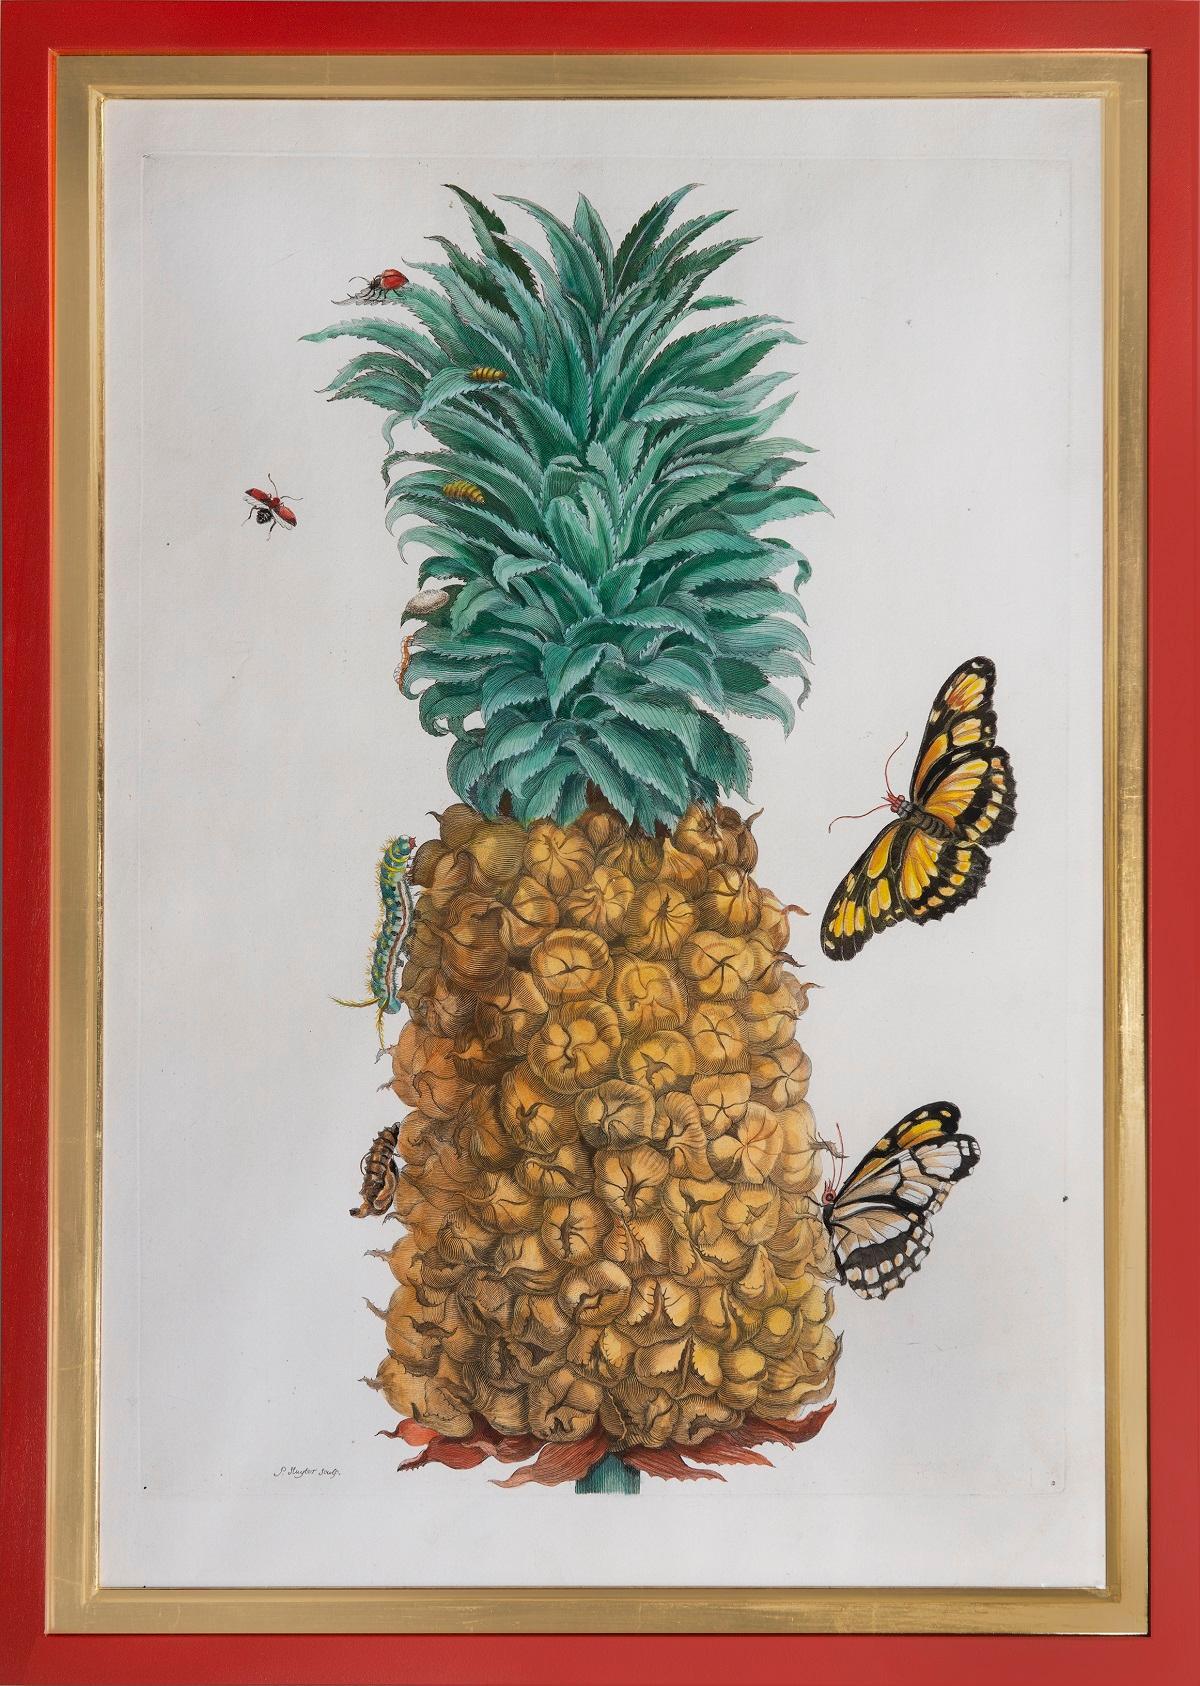 The Pineapple Fruit.